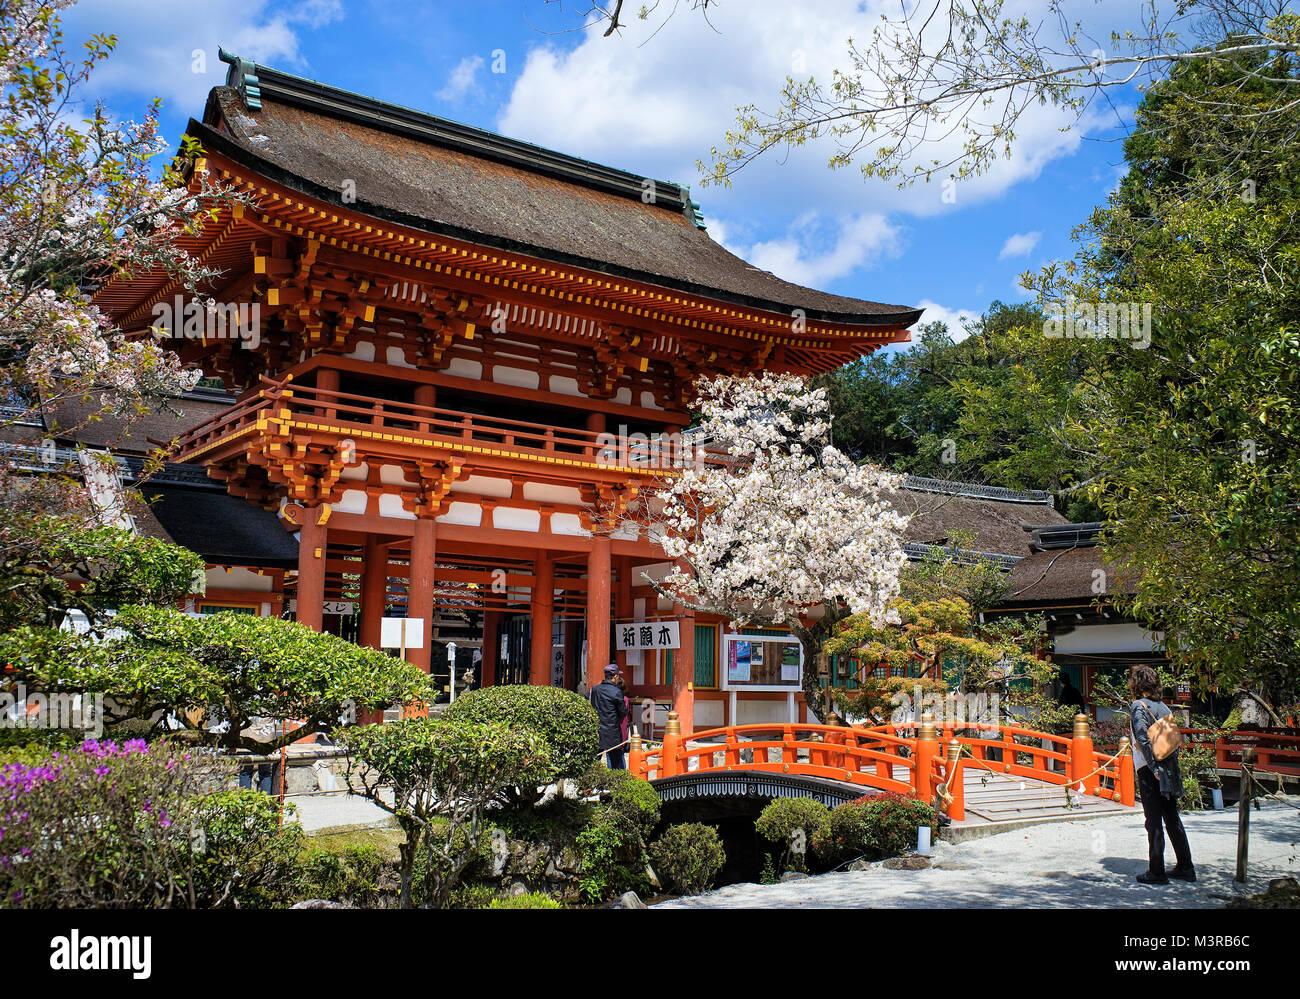 Japan, Honshu island, Kansai, Kyoto, the Kamigamo jinja sanctuary. Stock Photo